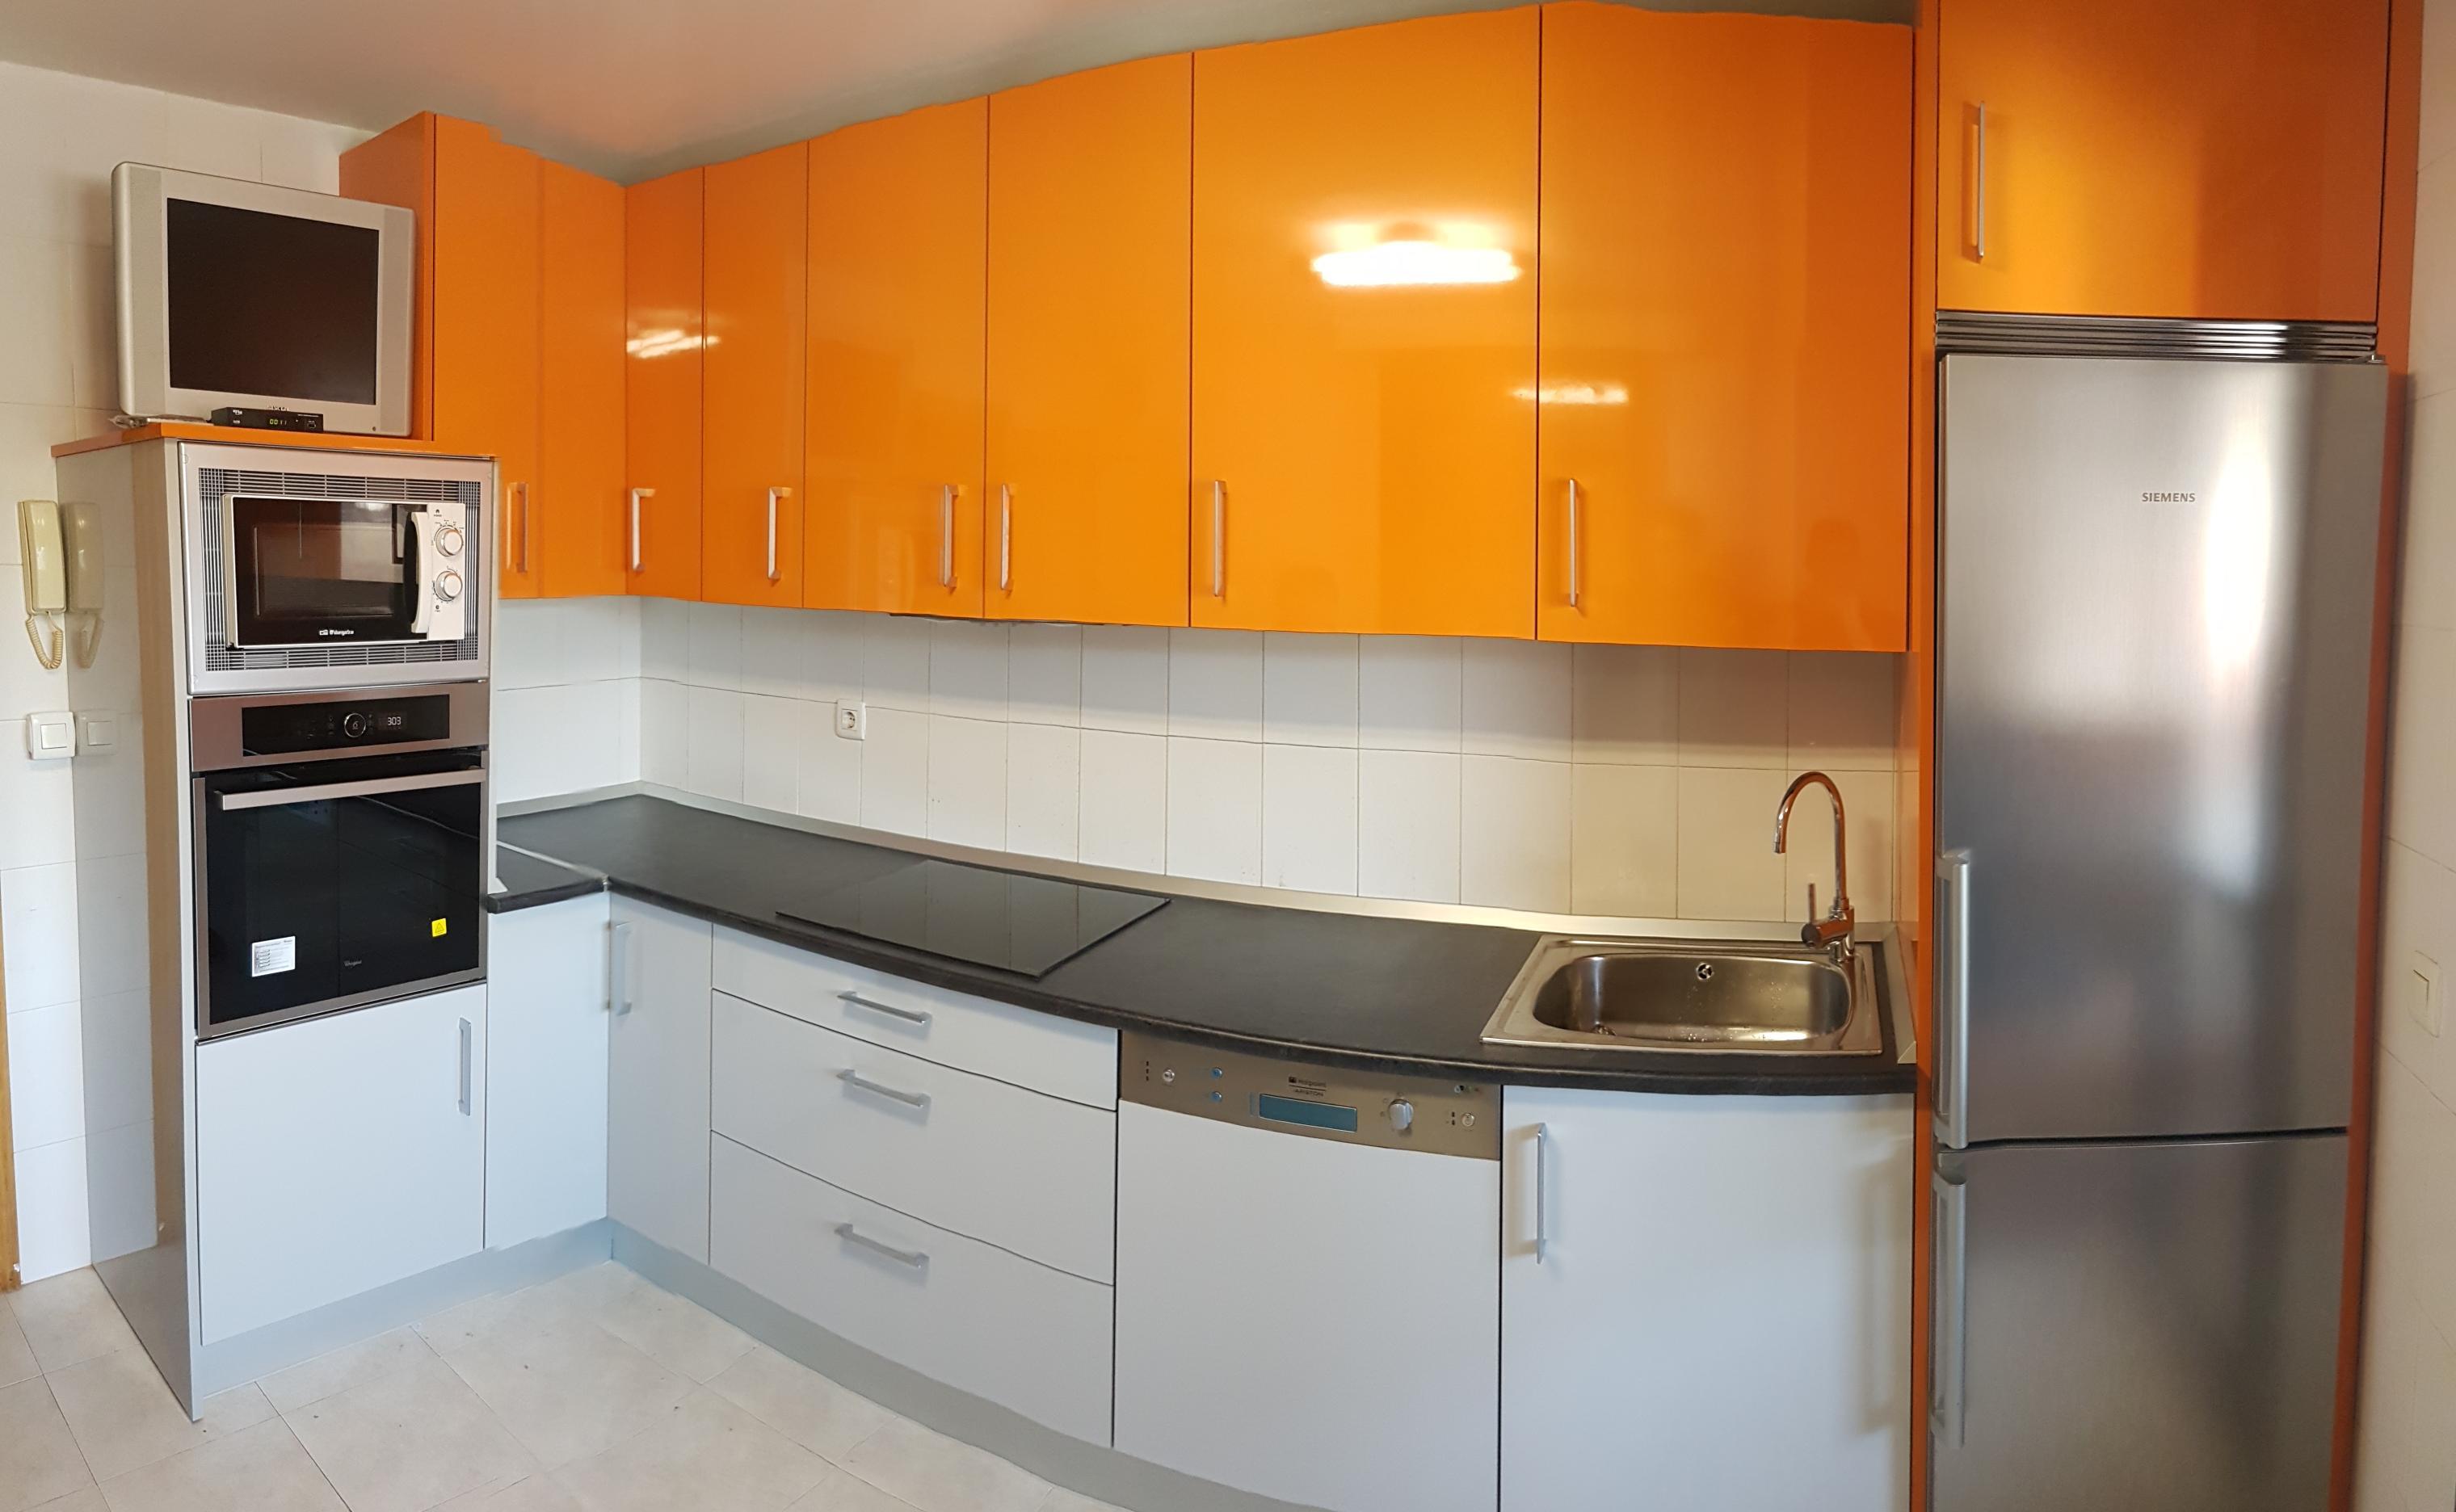 Cocina Naranja Gris Vera Bidasoa Cocinas Zurione # Muebles Bidasoa